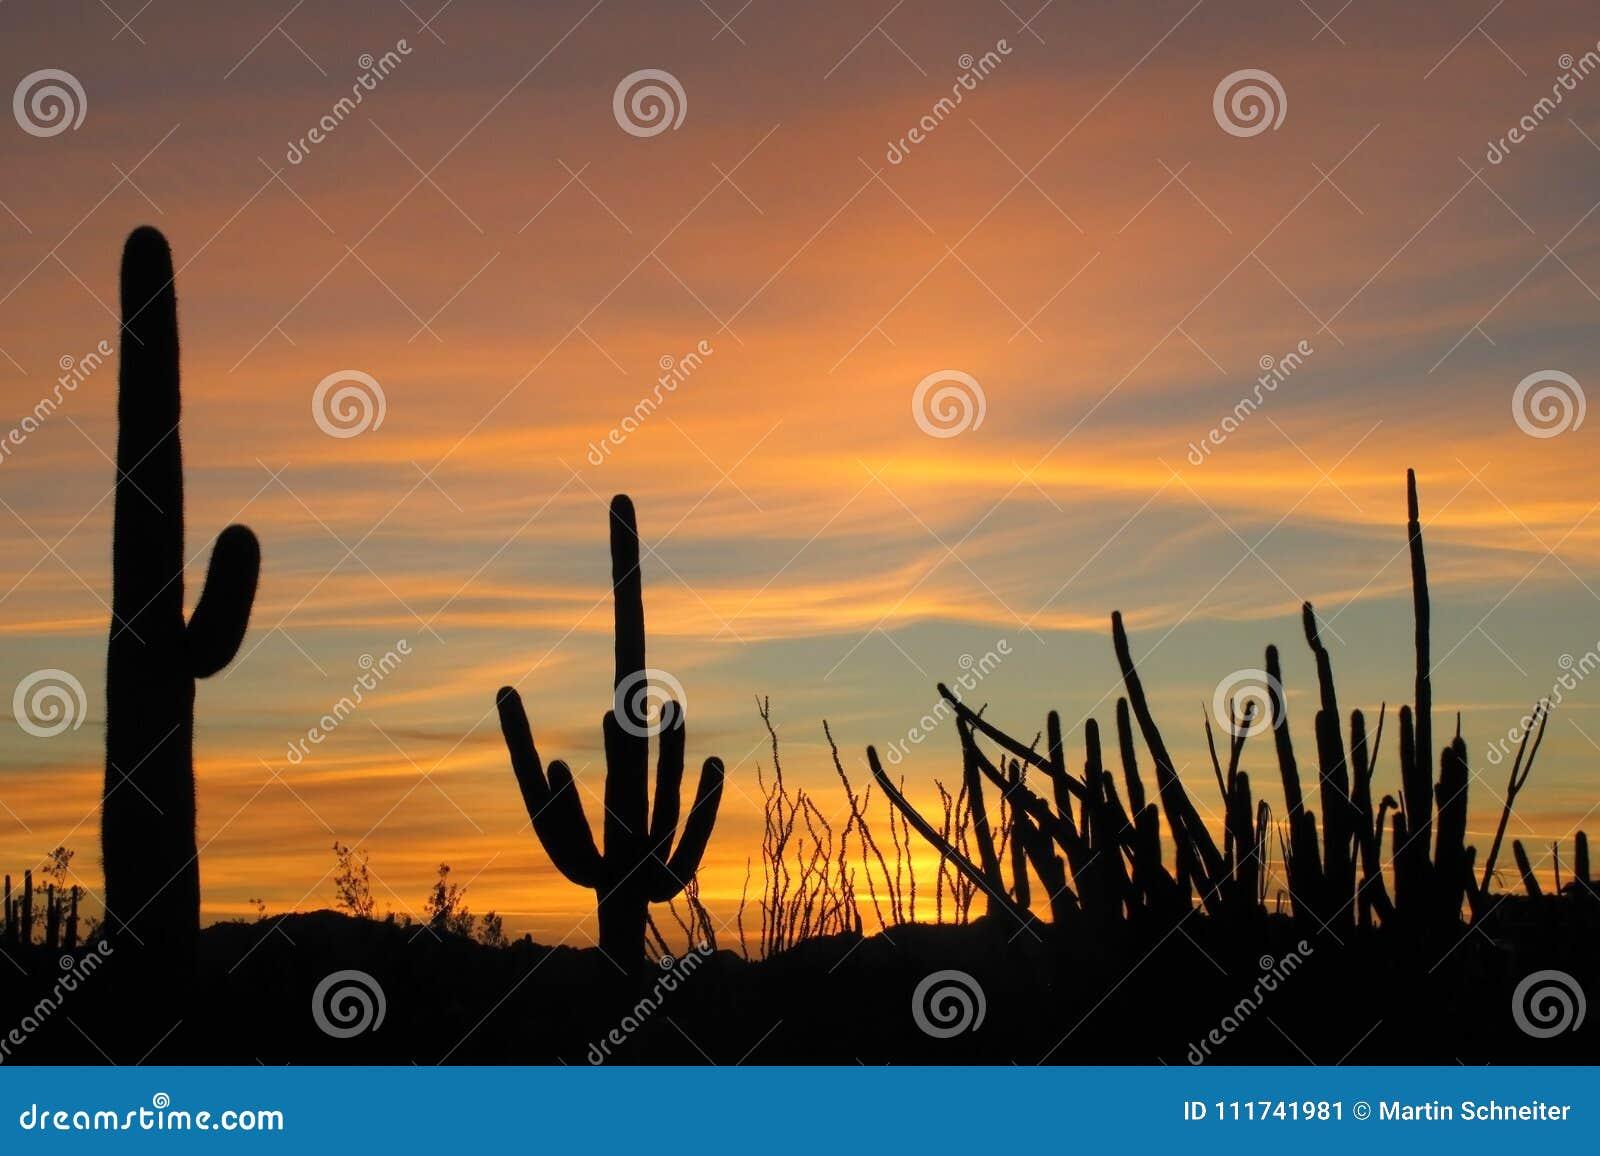 Saguaro, σωλήνας οργάνων και κάκτοι Ocotillo στο ηλιοβασίλεμα στο εθνικό μνημείο κάκτων σωλήνων οργάνων, Αριζόνα, ΗΠΑ